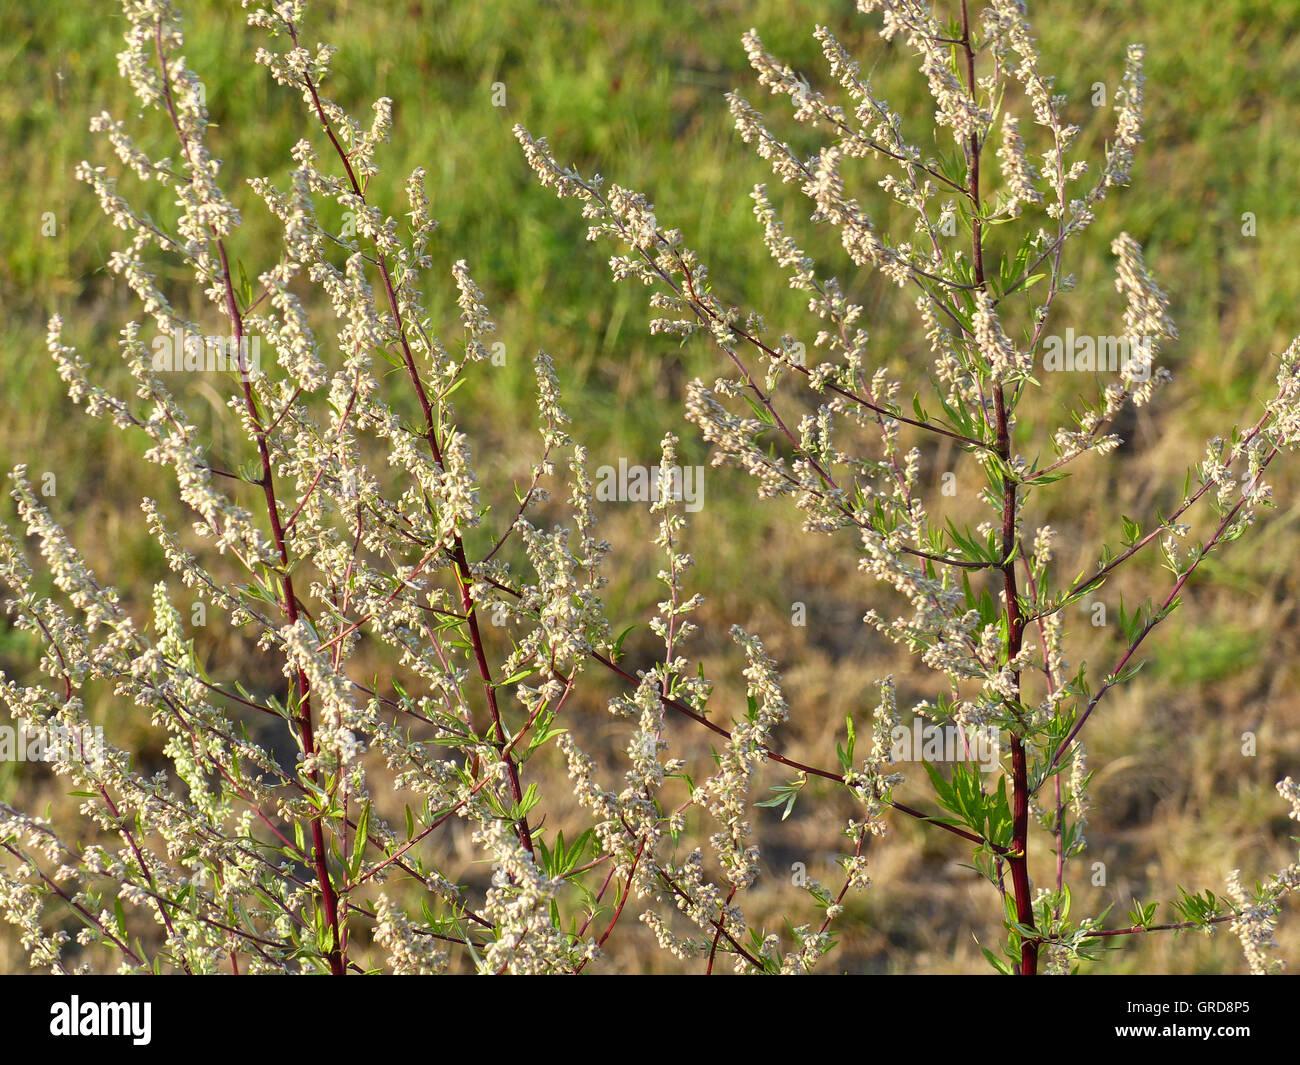 Mugwort, Artemisia Vulgaris, Medical Plant - Stock Image